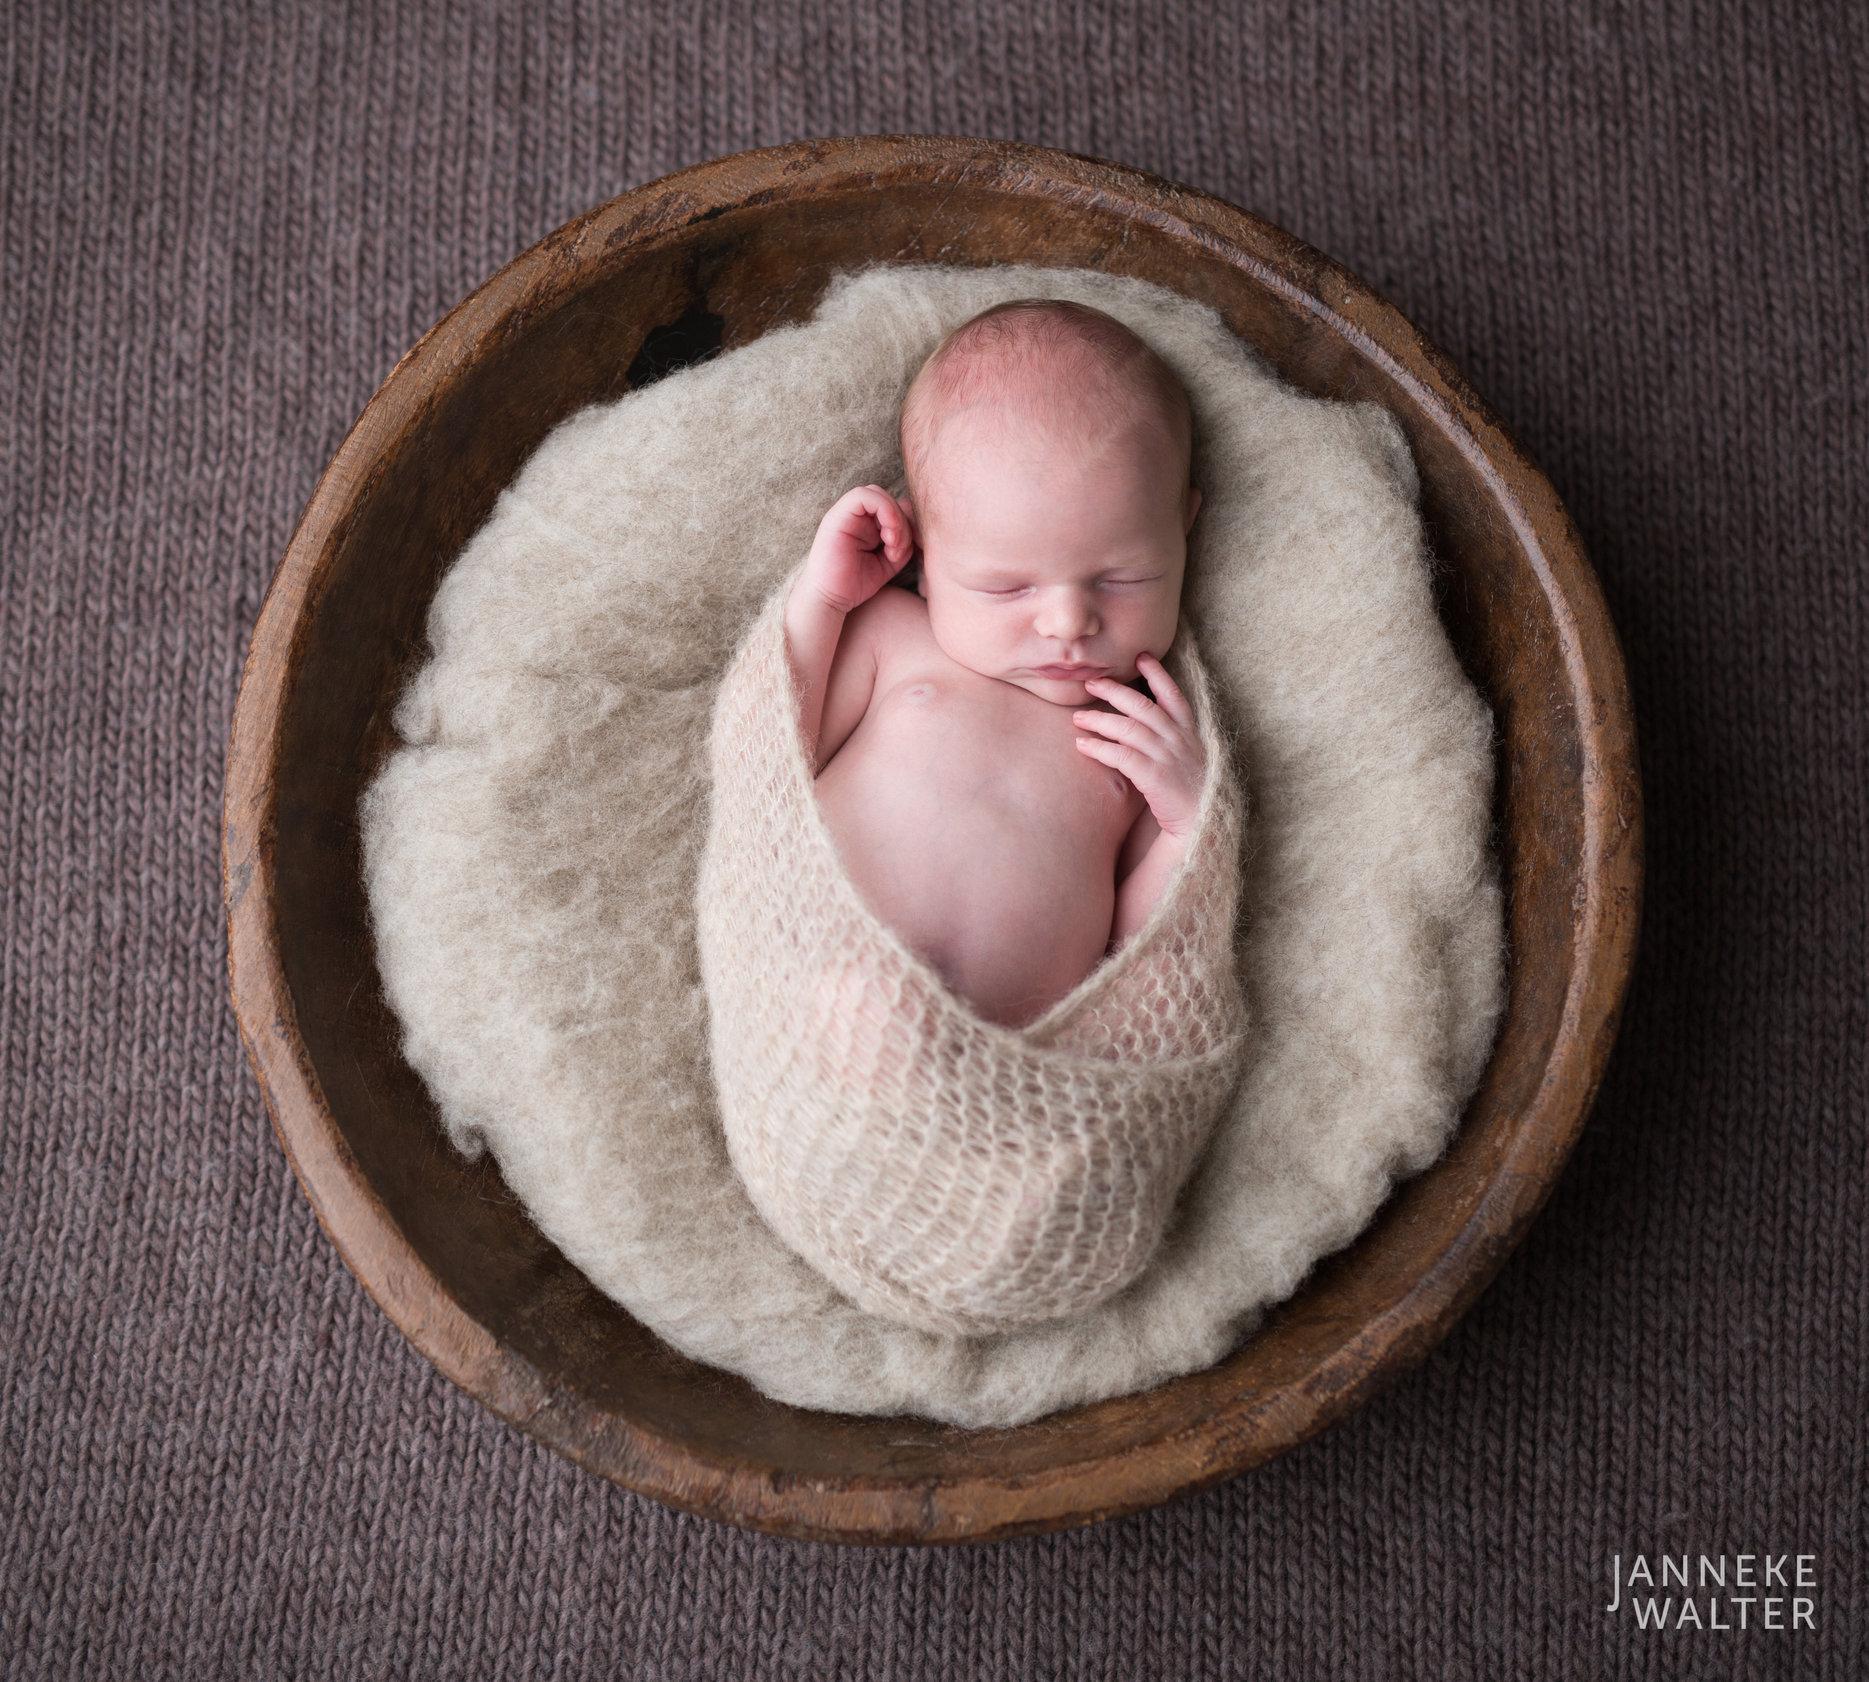 Foto newborn baby houten schaal @ Janneke Walter, newborn fotograaf Utrecht De Bilt, newborn fotografie, babyfotografie, newborn fotoshoot, newborn shoot